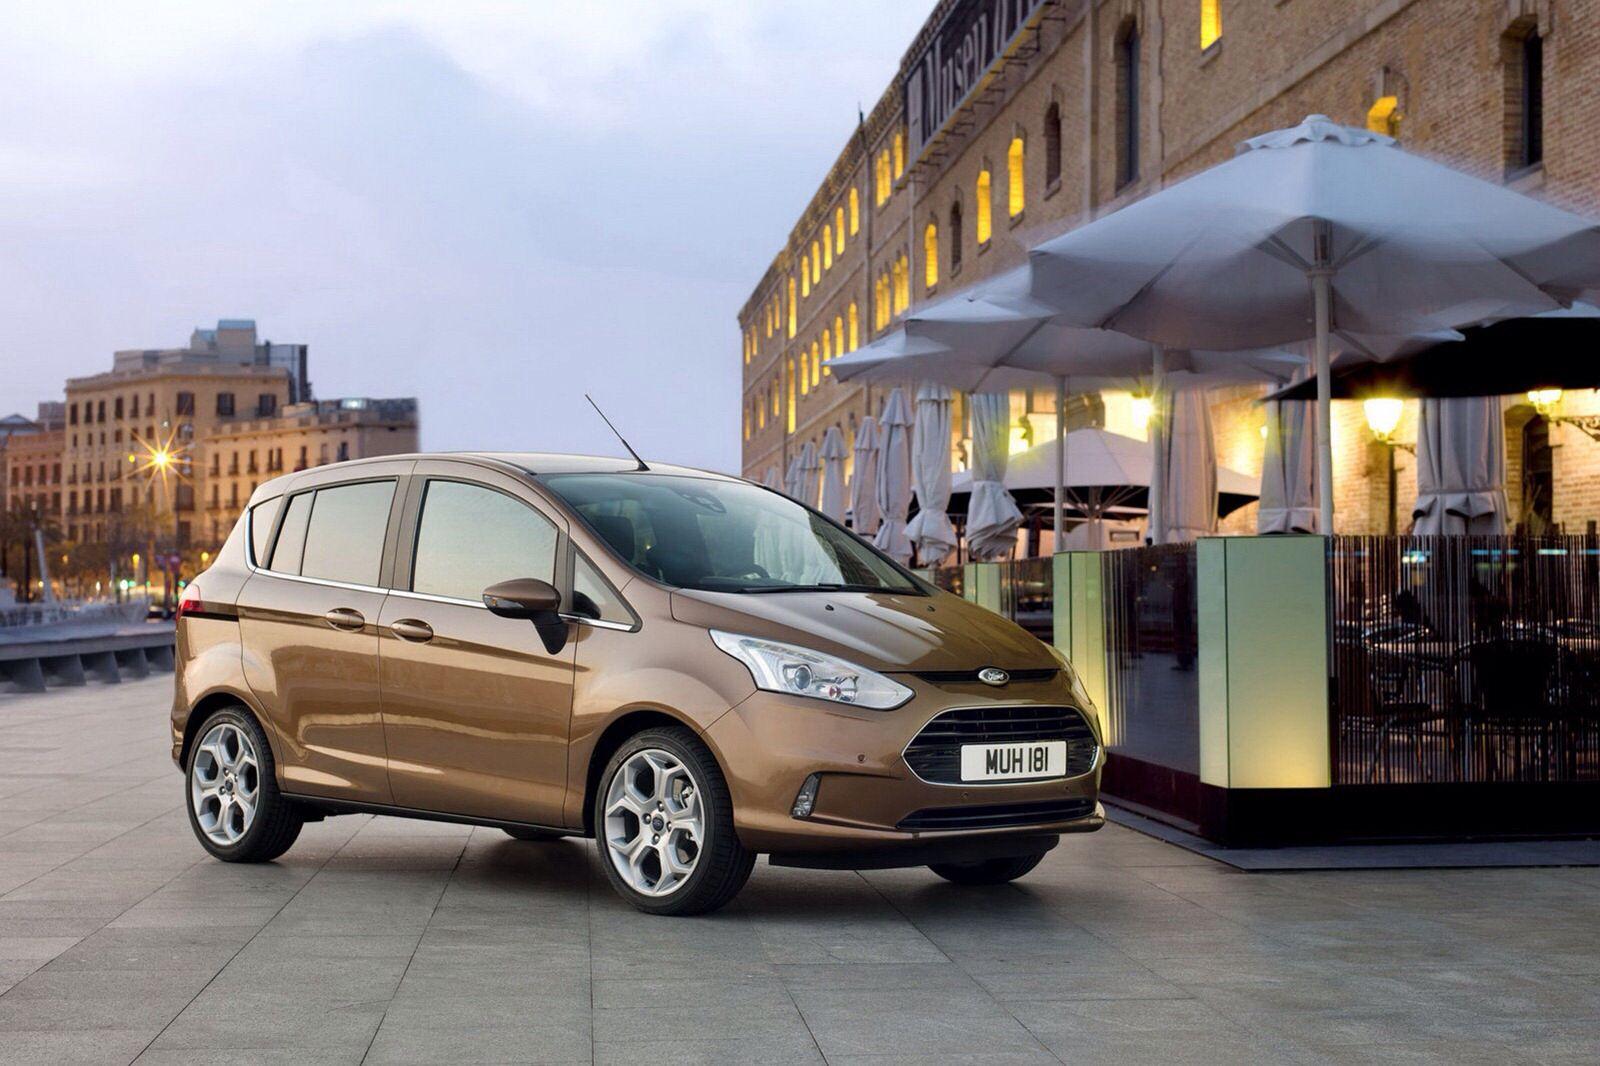 Ford sync harrison ford ford motor company auto motor city car model texts html minivan